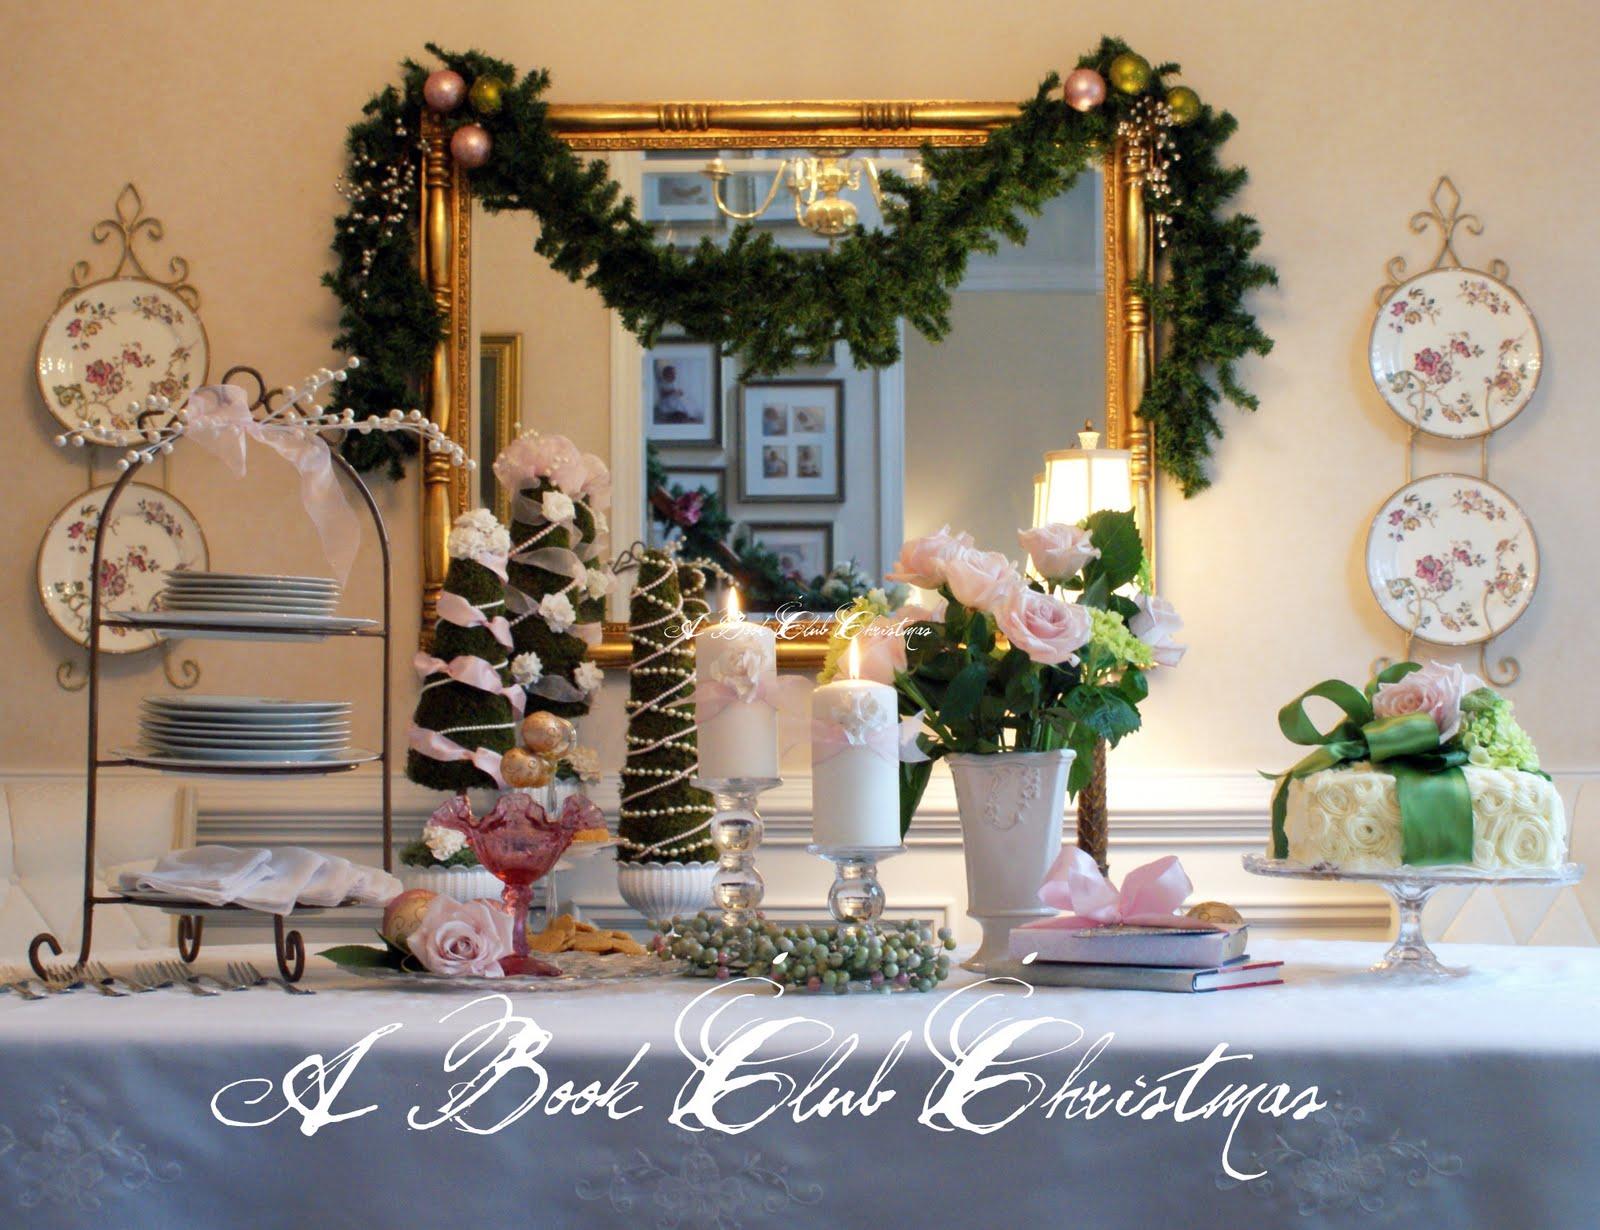 a little loveliness: a book club christmas